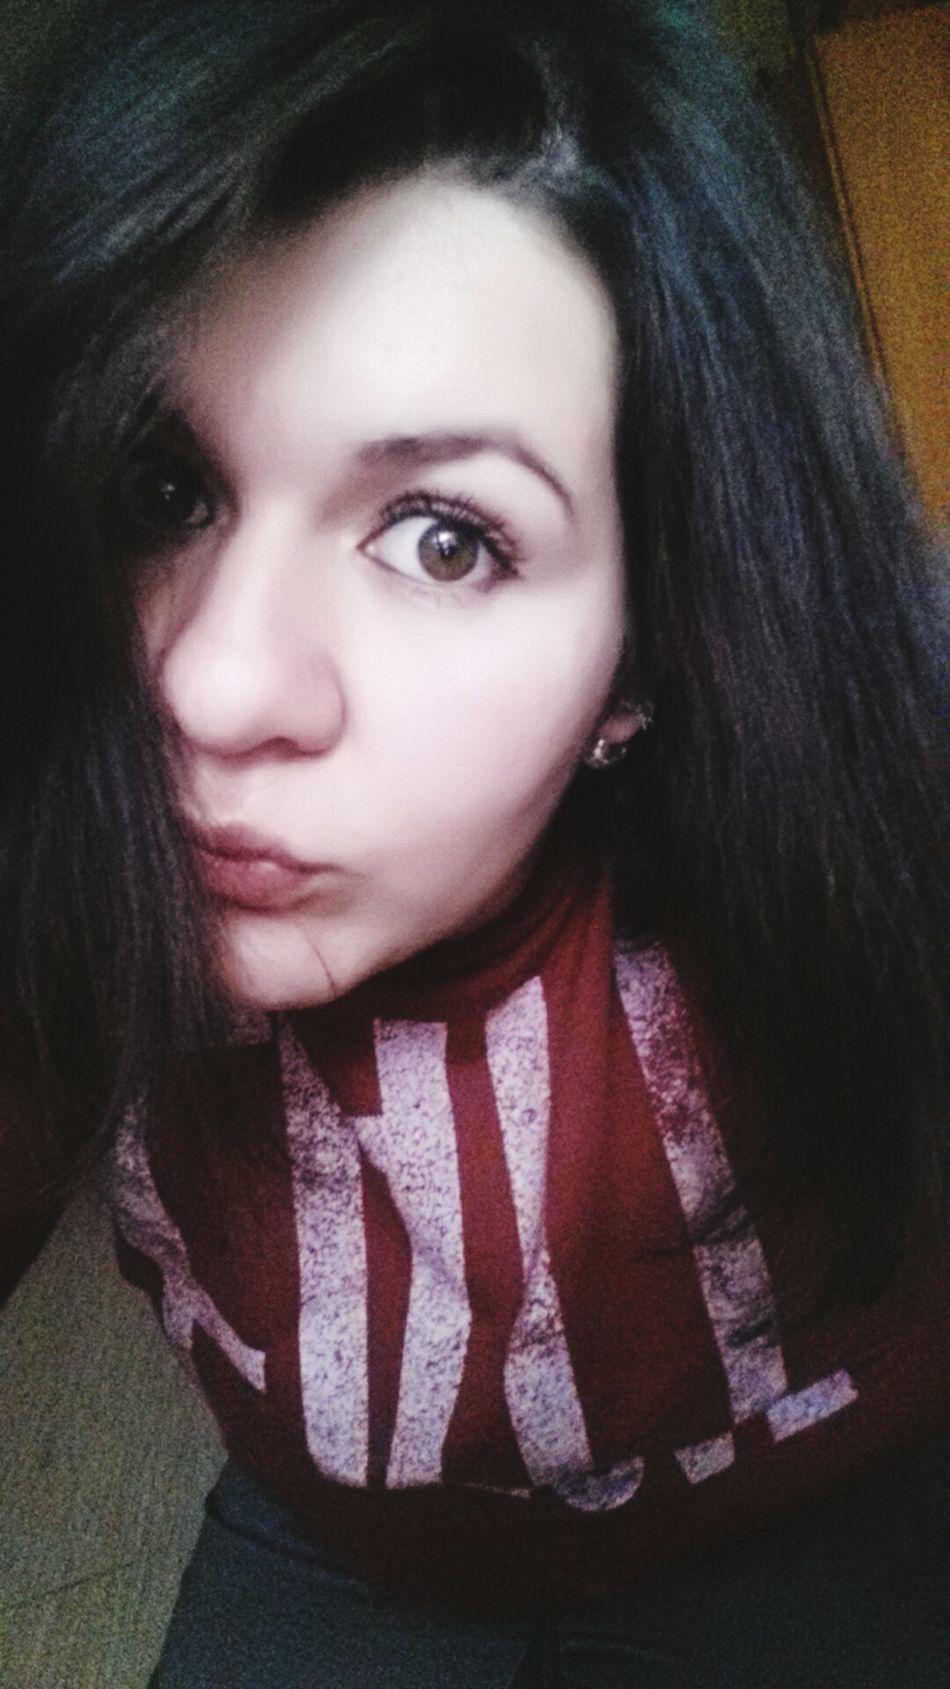 Hi Hello World Sexylips Today's Hot Look Shut Up And Kiss Me:* Follow Me I'll Follow Back EyeEm Best Shots Followforlike That's Me Big Eyes♡ Feelingsexy Goodvibes✌️ Eyemphotography Follow4follow Feeling Blessed Selfie ✌ Love My Eyes <3 Look Into My Eyes... Sexyselfie Feeling Pretty Kisses Eyeeem Best Shots Hi! Kiss Me Baby ❤ Feeling Beautiful